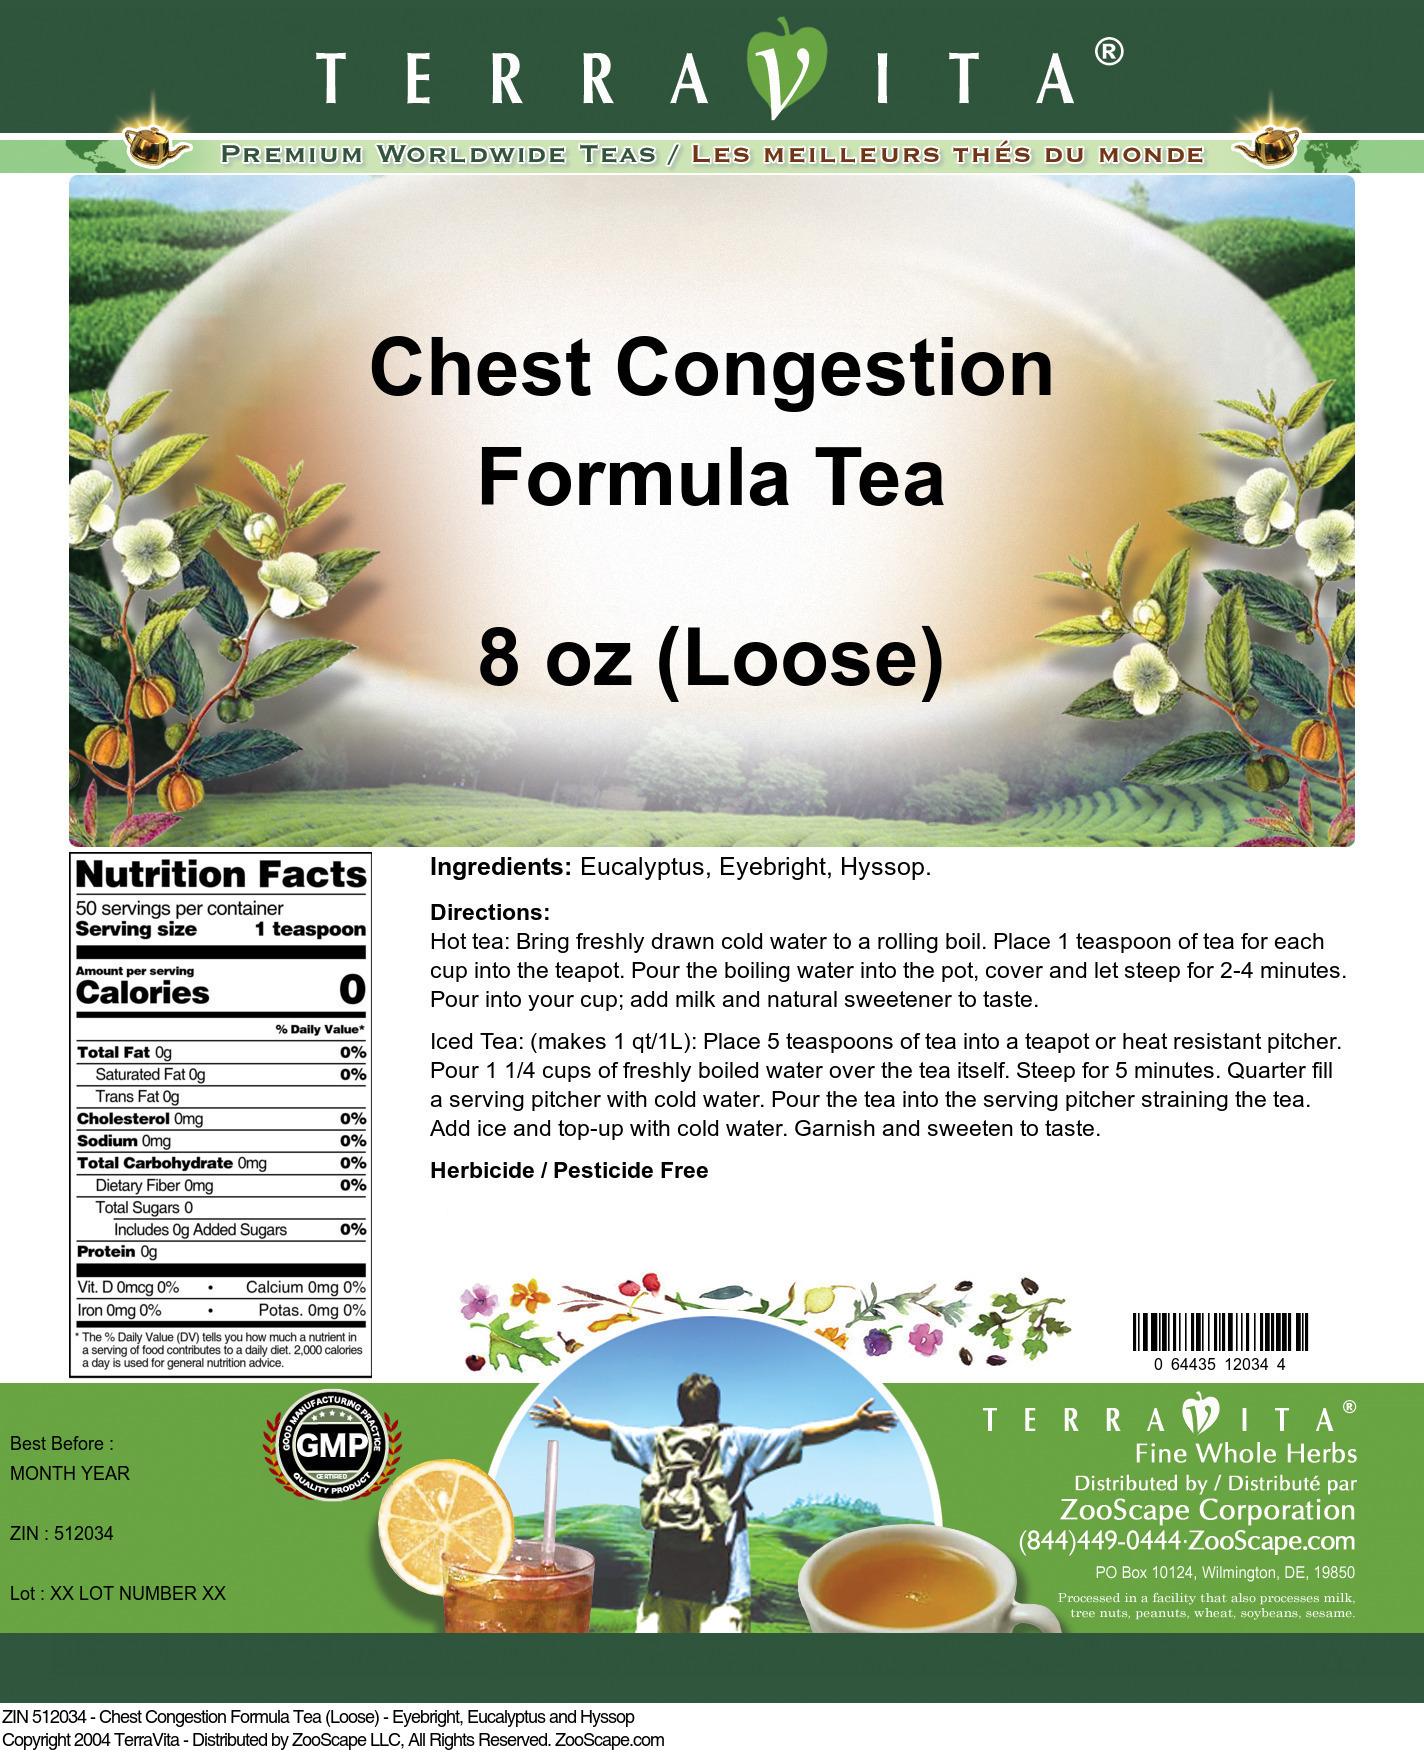 Chest Congestion Formula